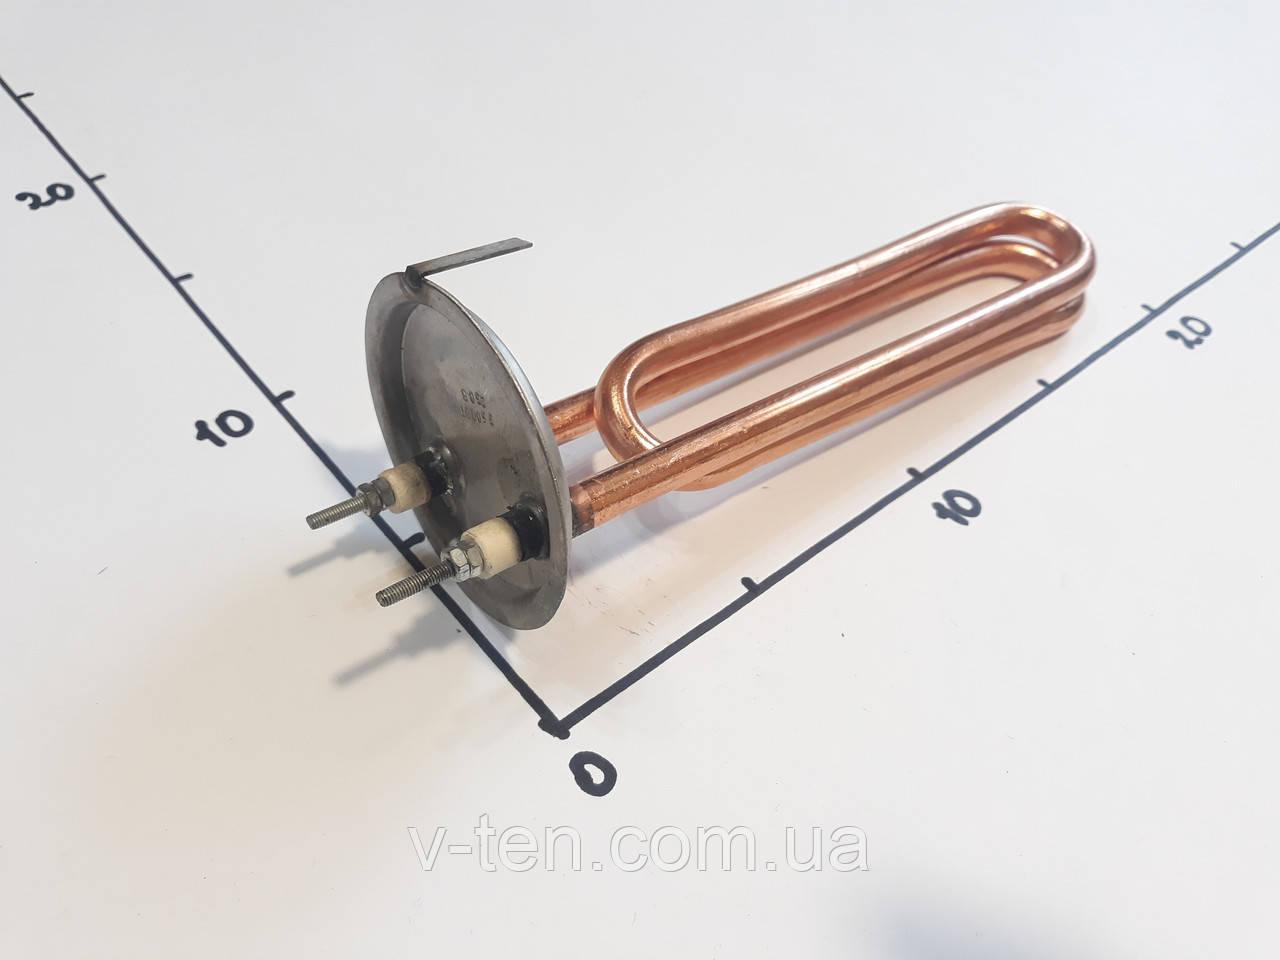 ТЭН 3500w для проточного водонагревателя Атмор